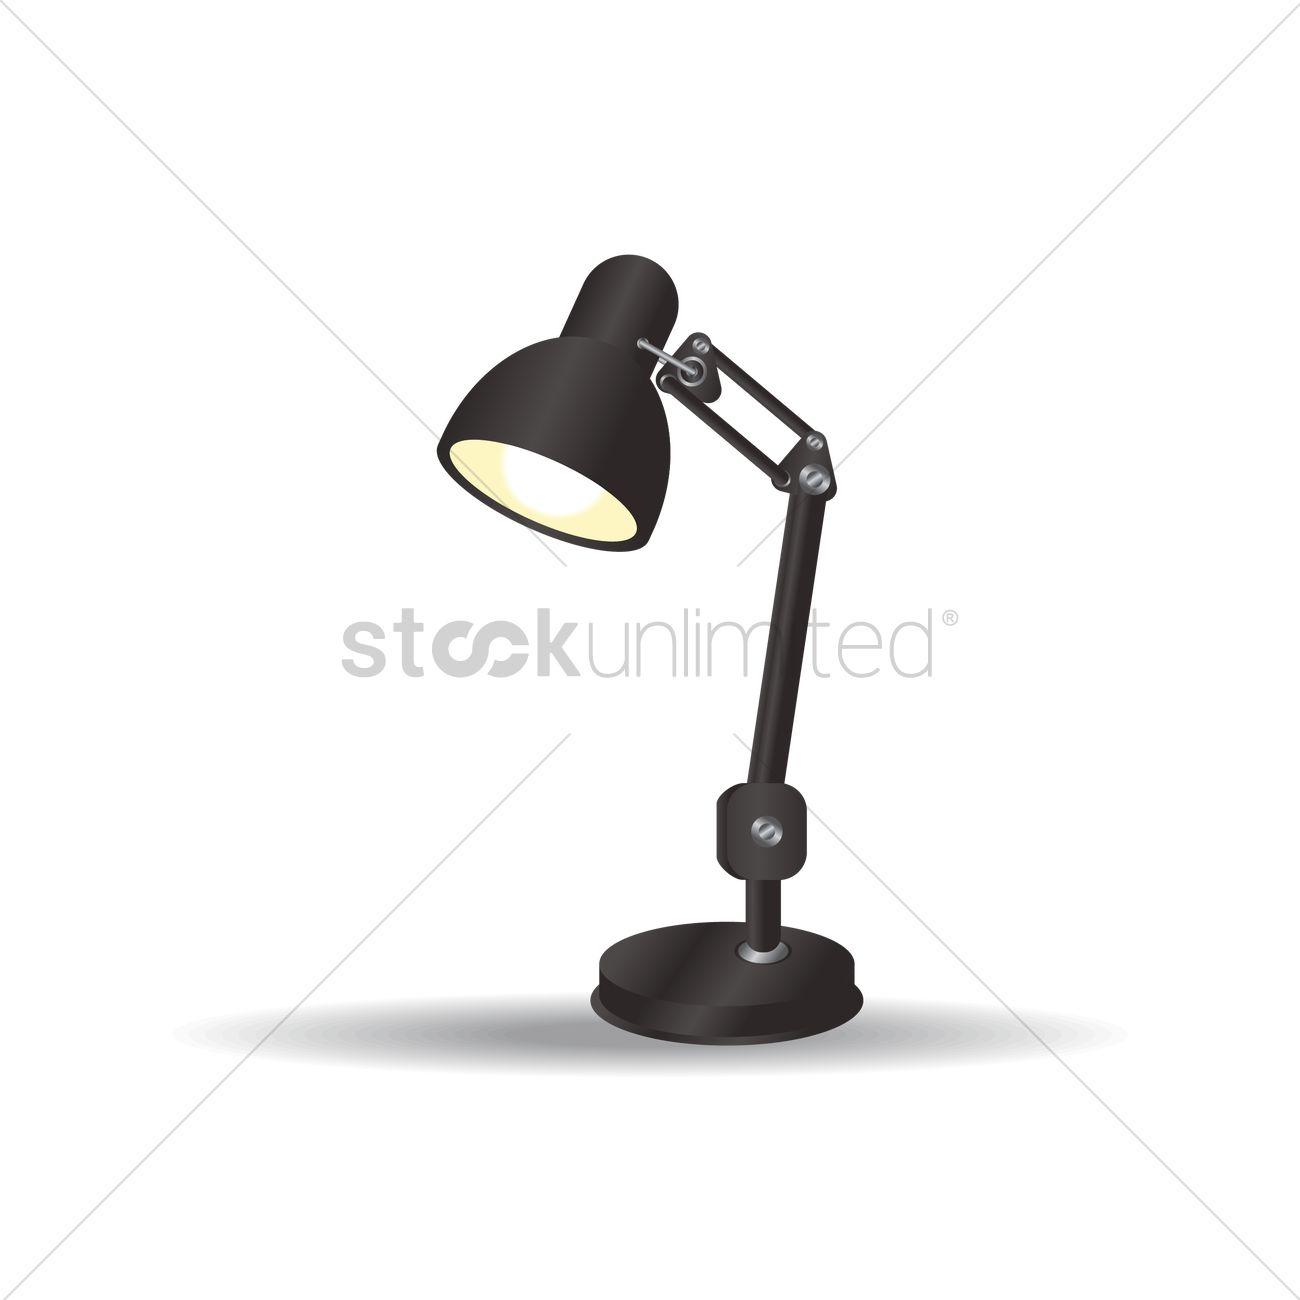 1300x1300 Desk Lamp Vector Image